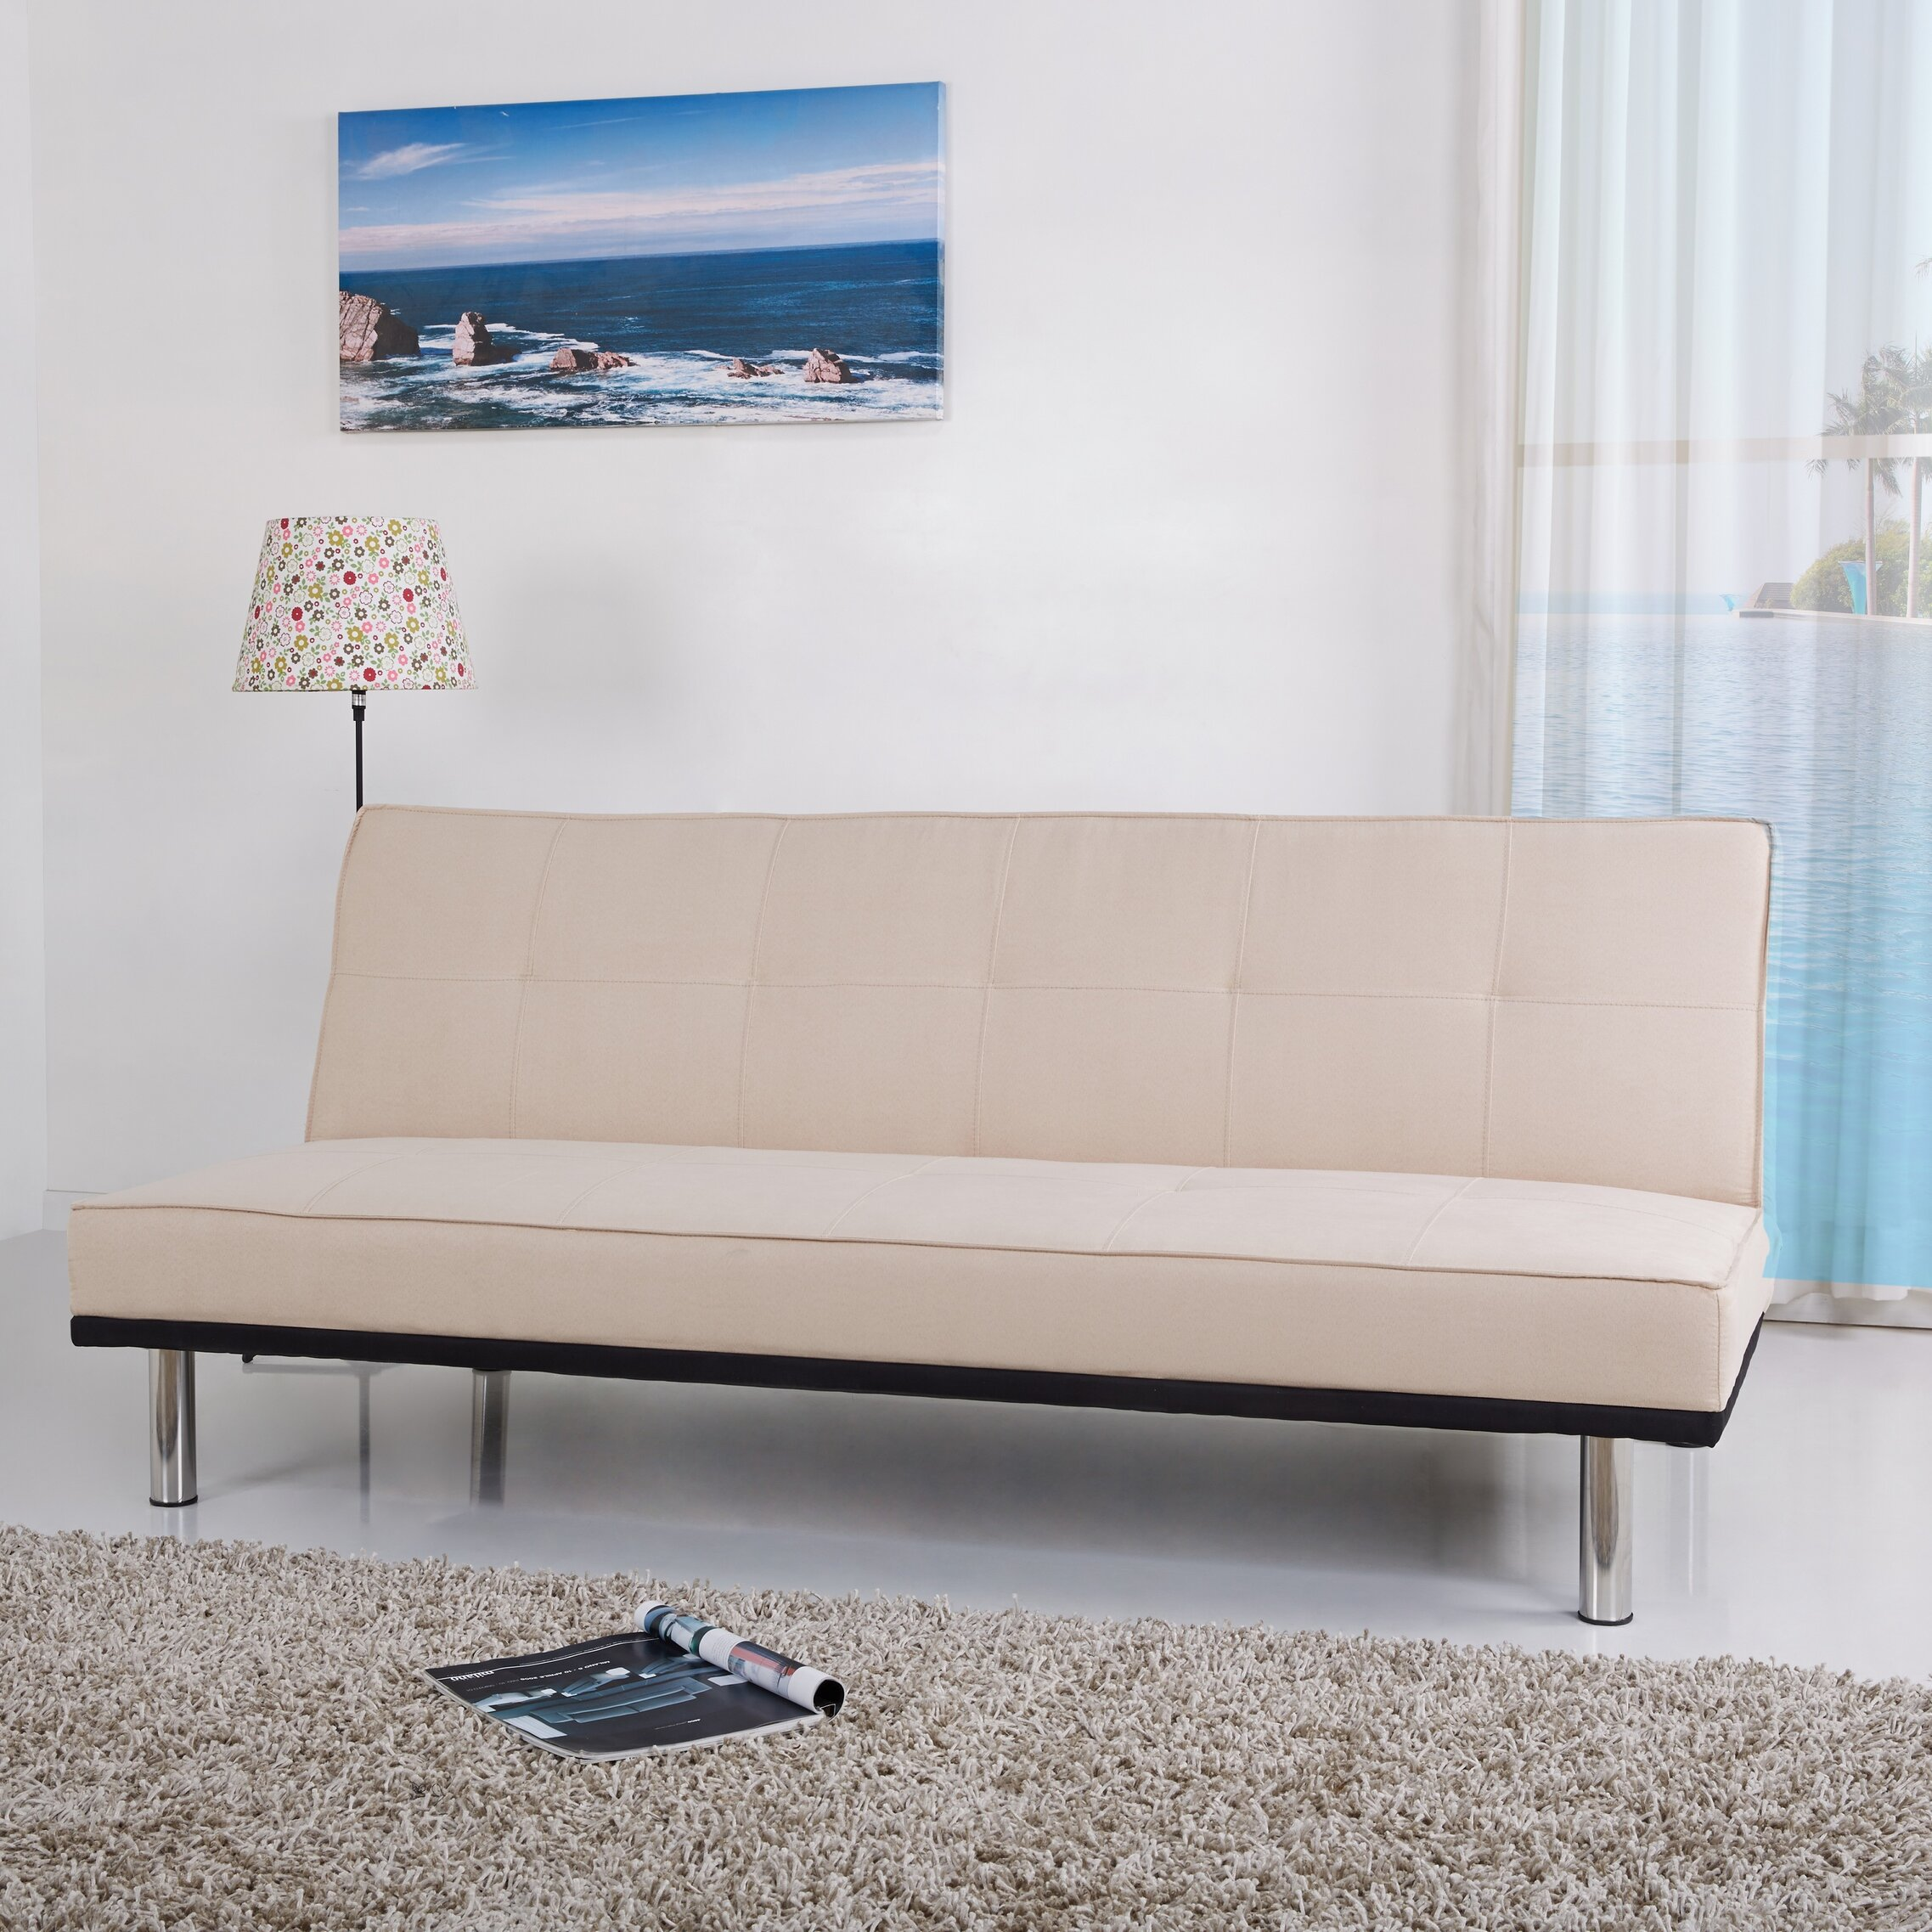 Leader lifestyle zenko 3 seater clic clac sofa bed reviews wayfair uk - Divan clic clac ikea ...